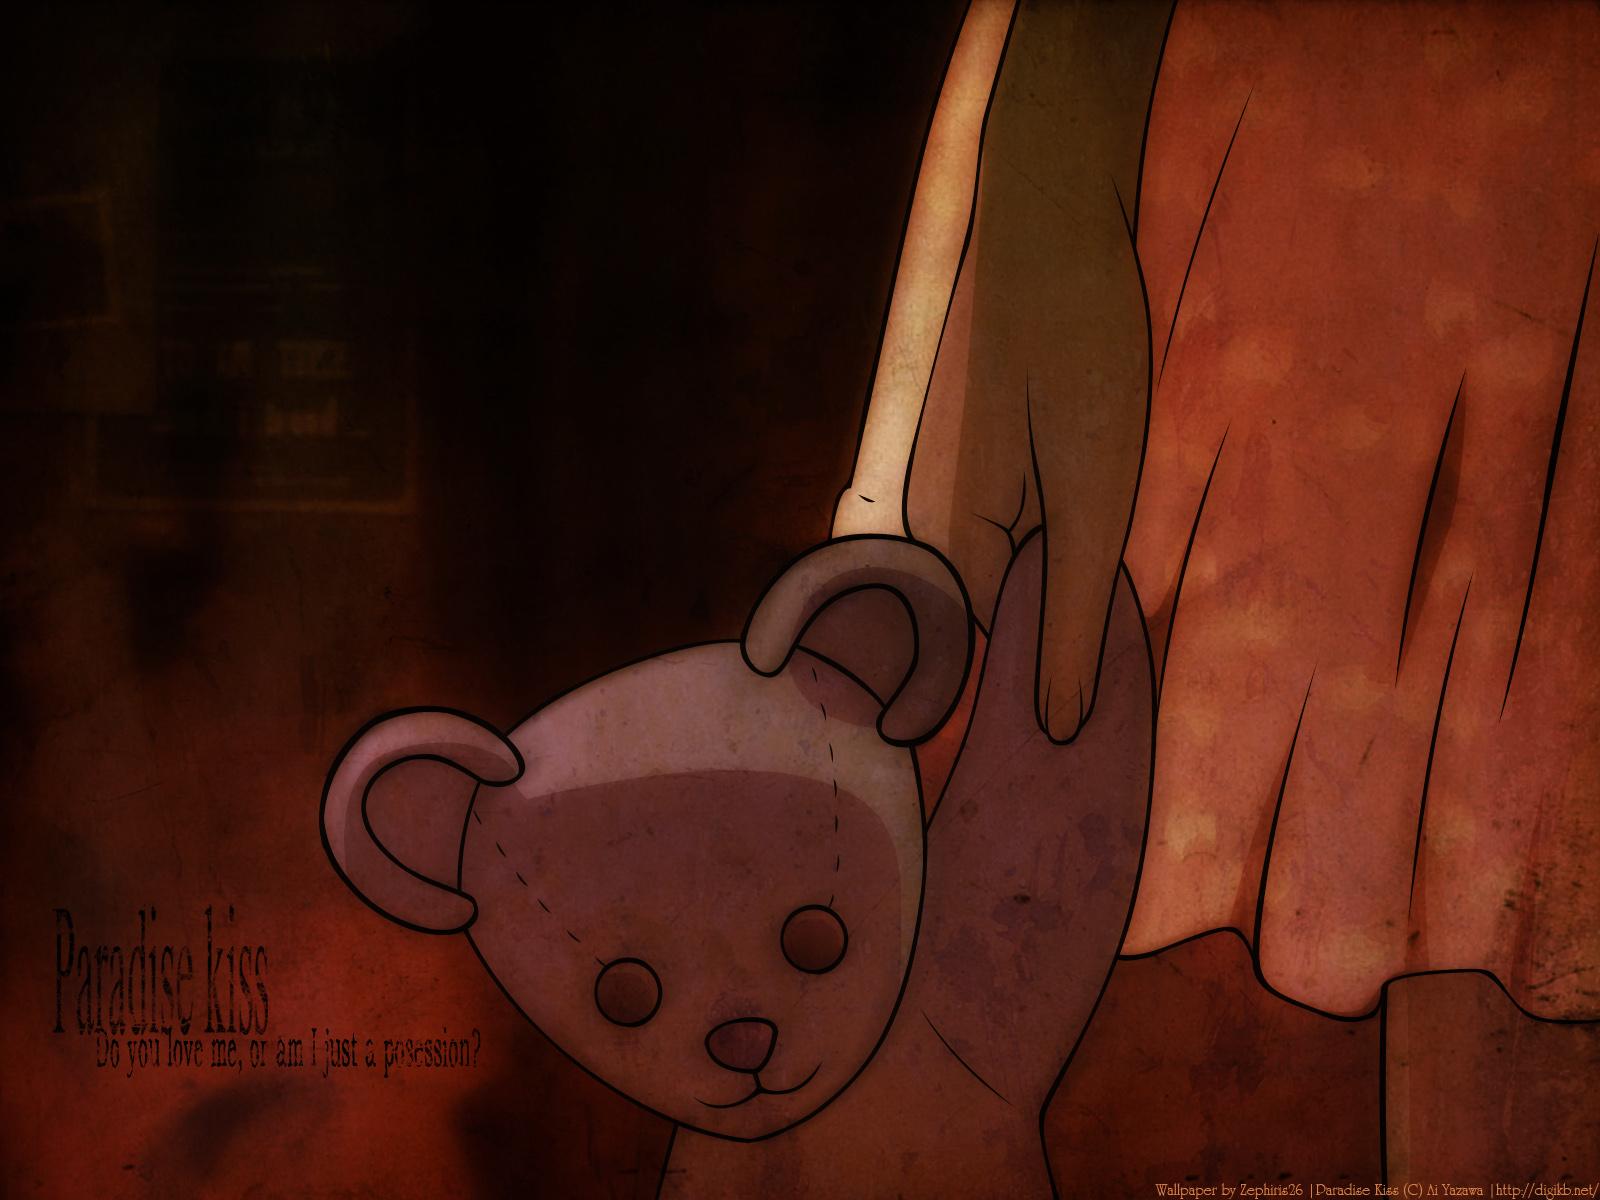 paradise_kiss teddy_bear watermark